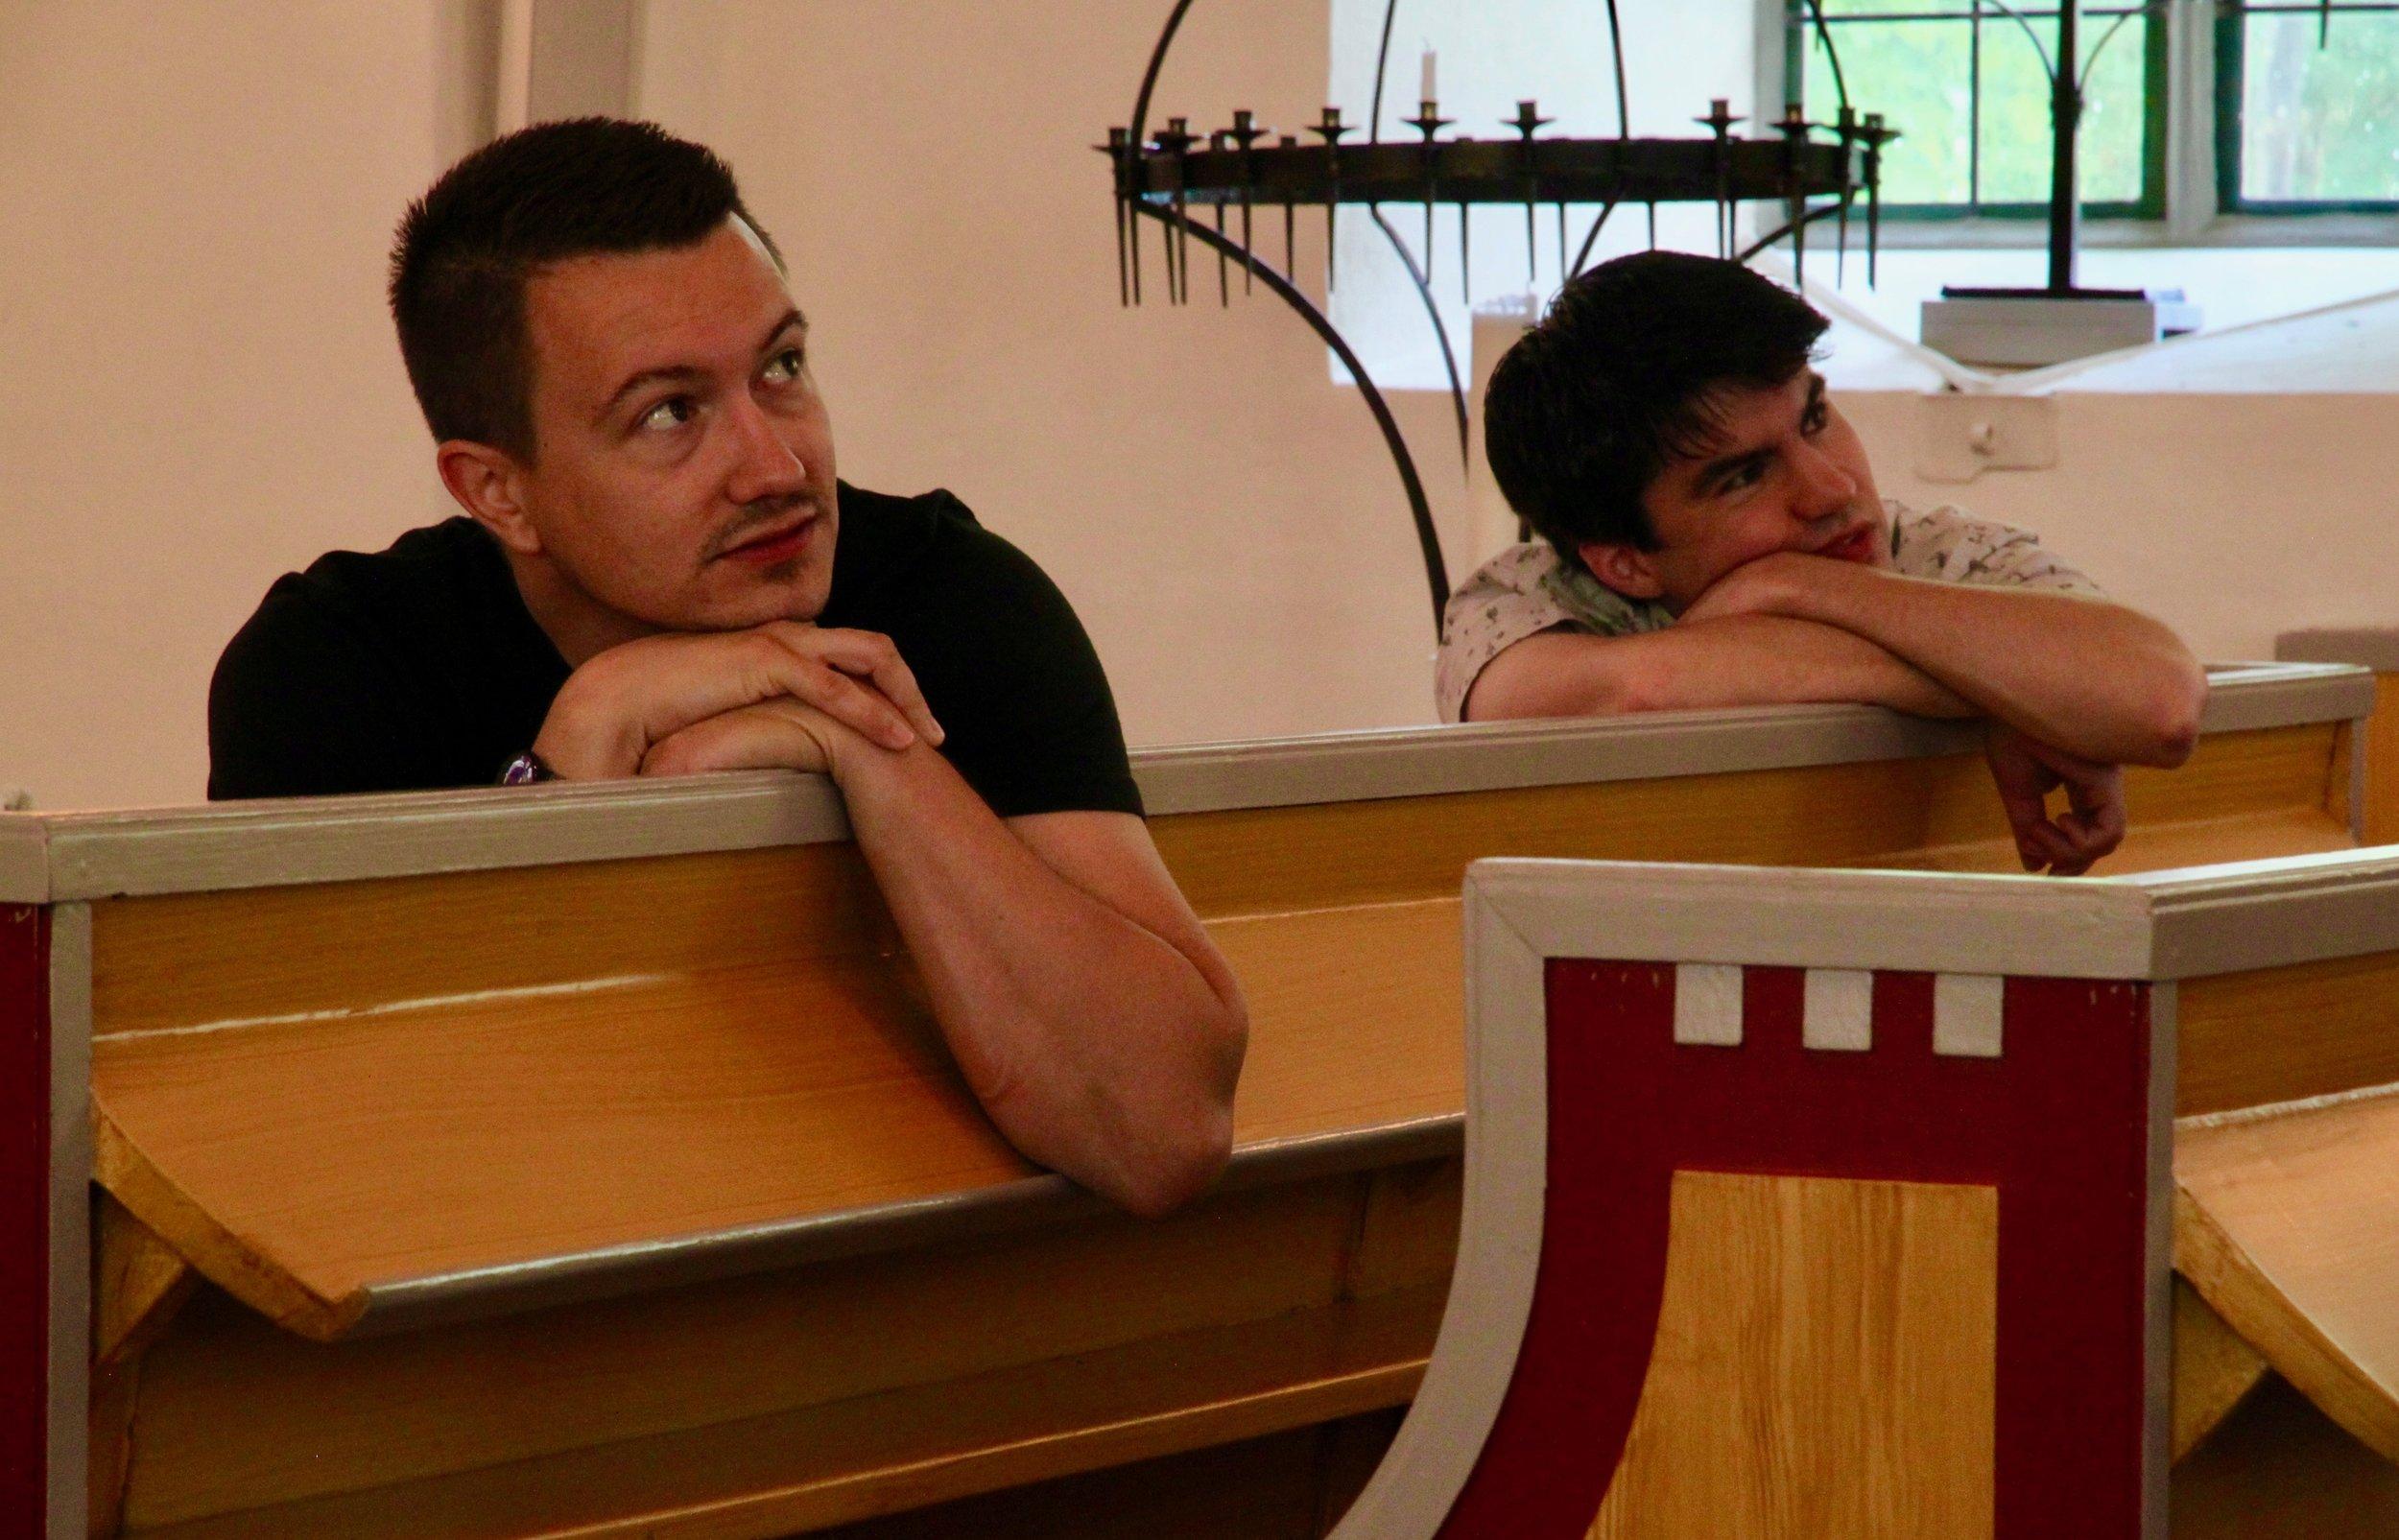 Brandon Santini and Corey De Tar listen intently.